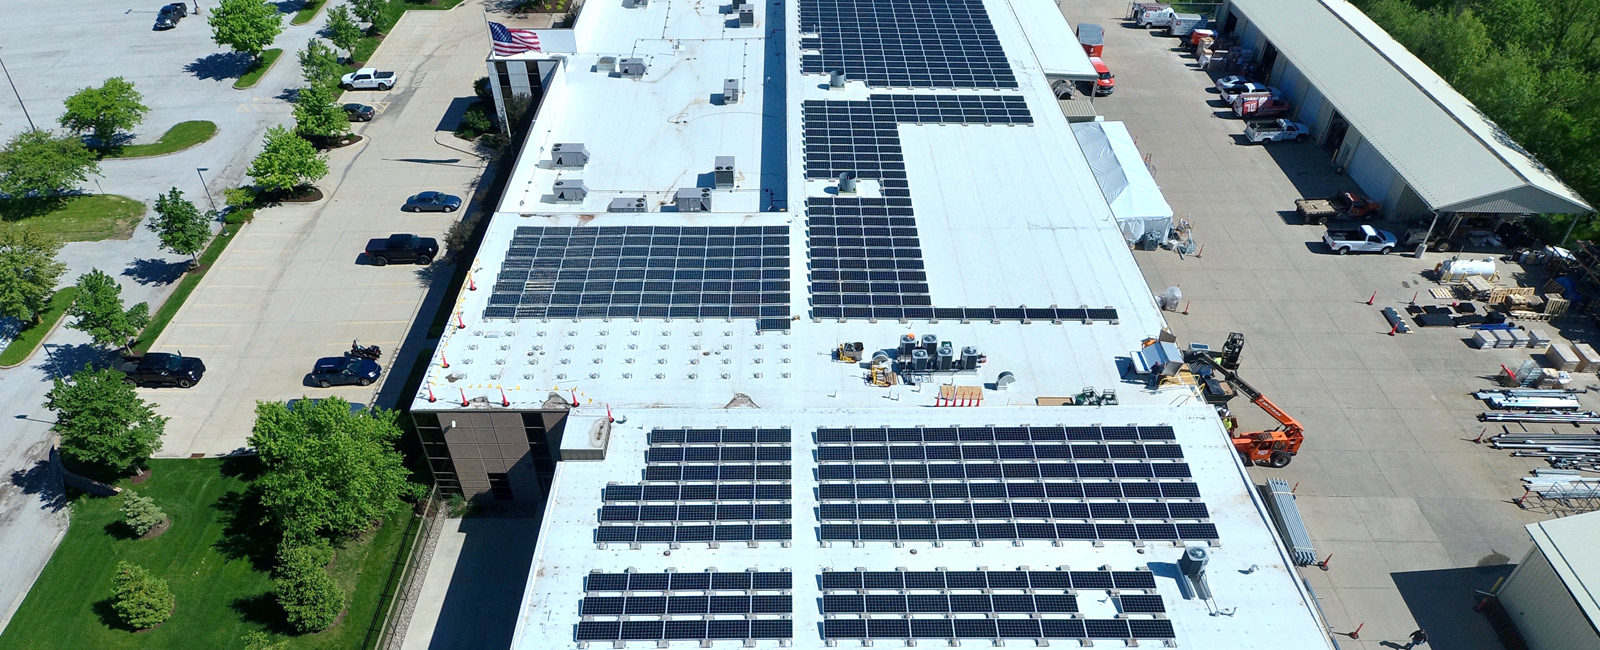 Tri-City Electrical Co. Solar Array